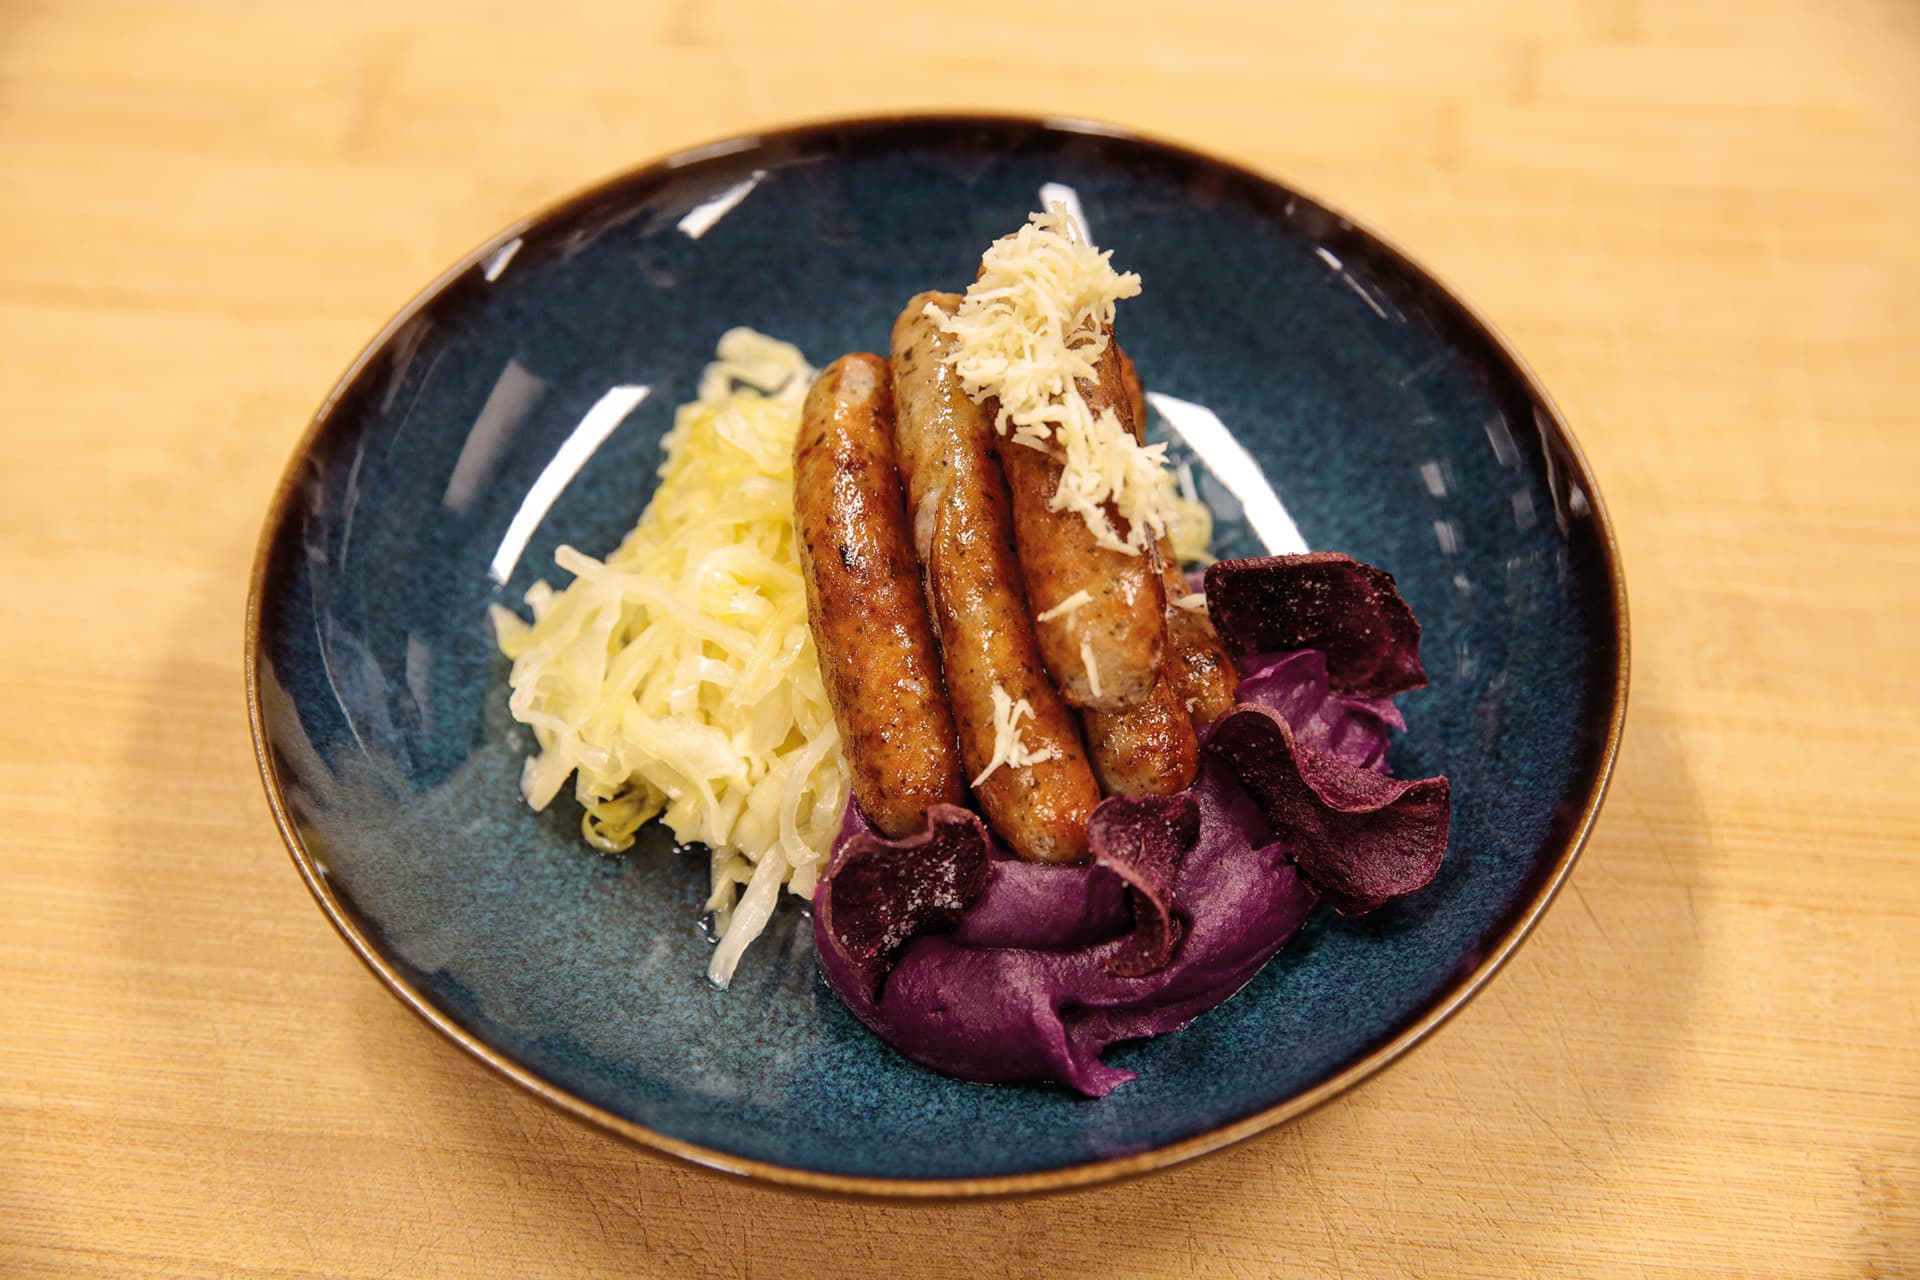 Nürnberger mal anders! - Nürnberger mit süß-saurem Spitzkohl, violetter Kartoffel, Zwetschgen-Dip und frisch geriebenem Kren